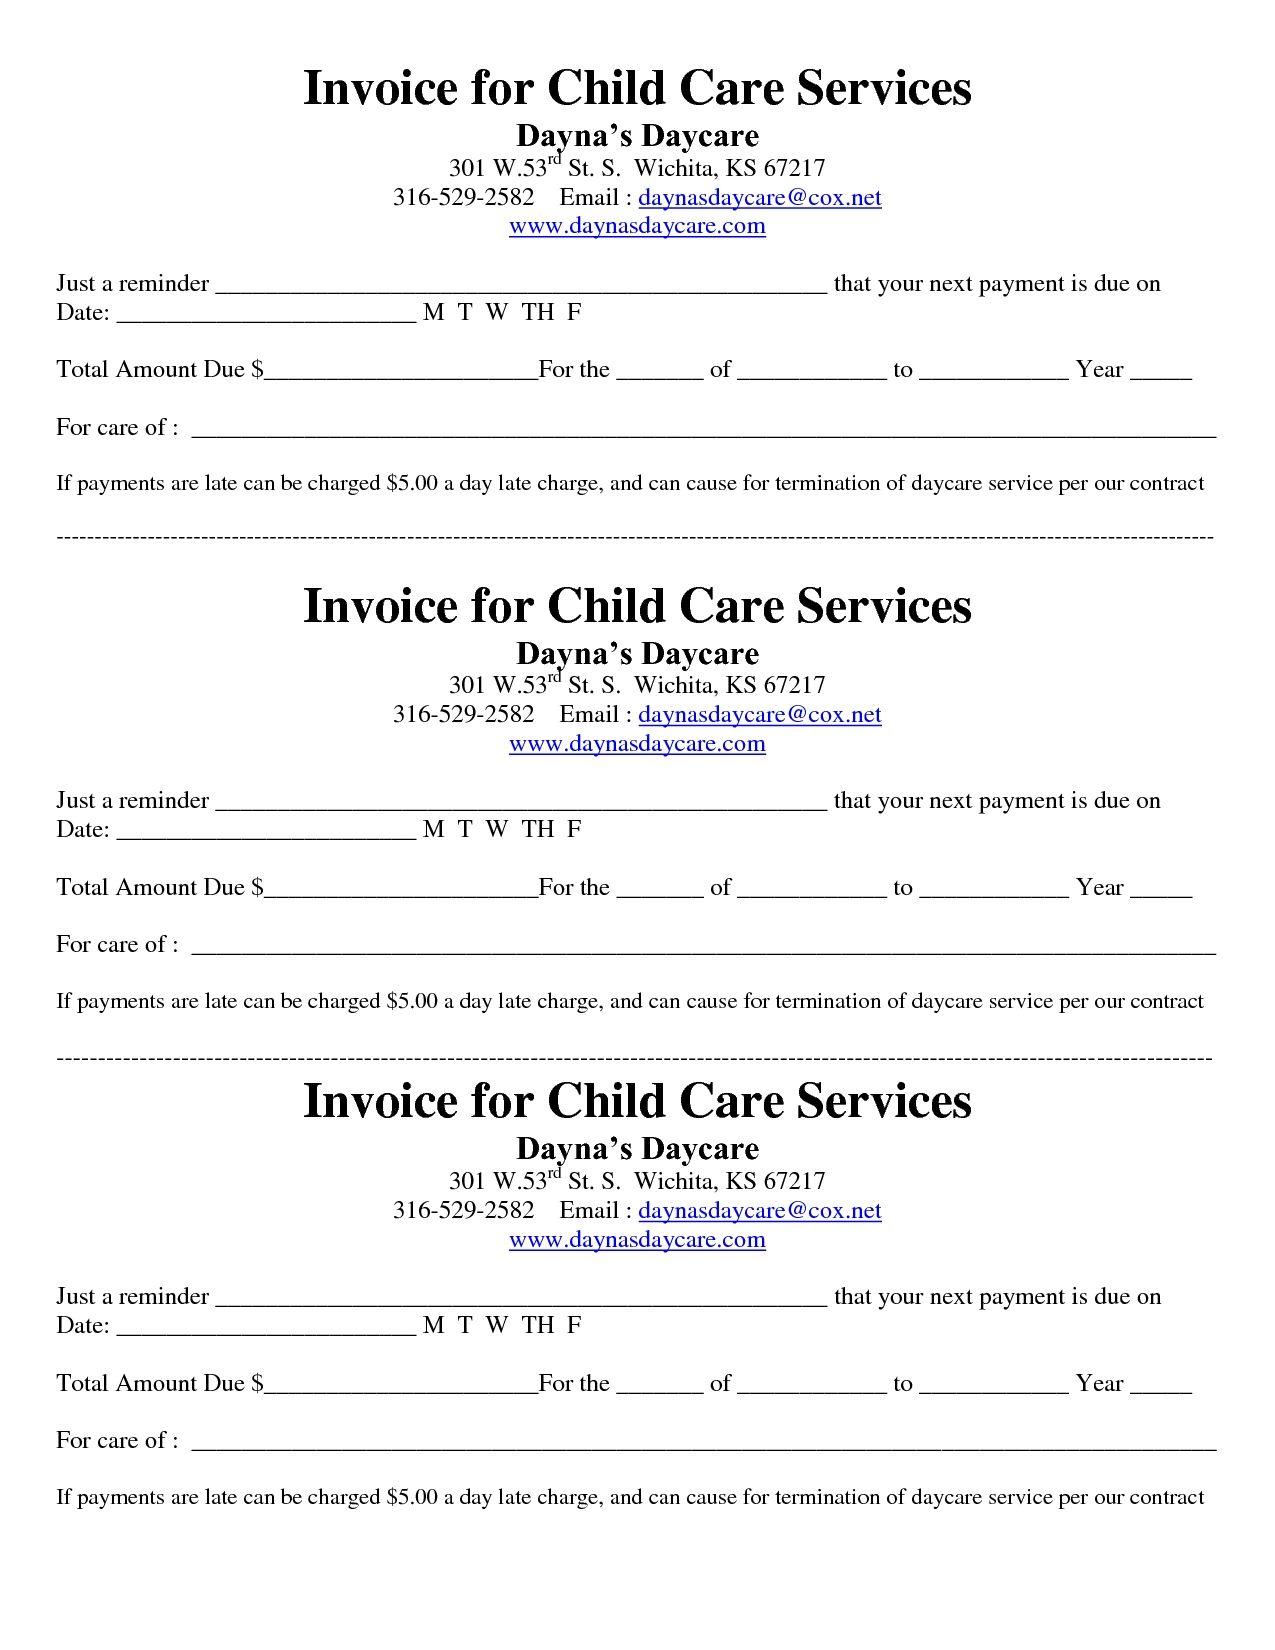 Child Care Receipt/invoice | Jordi Preschool - Free Printable Daycare Receipts